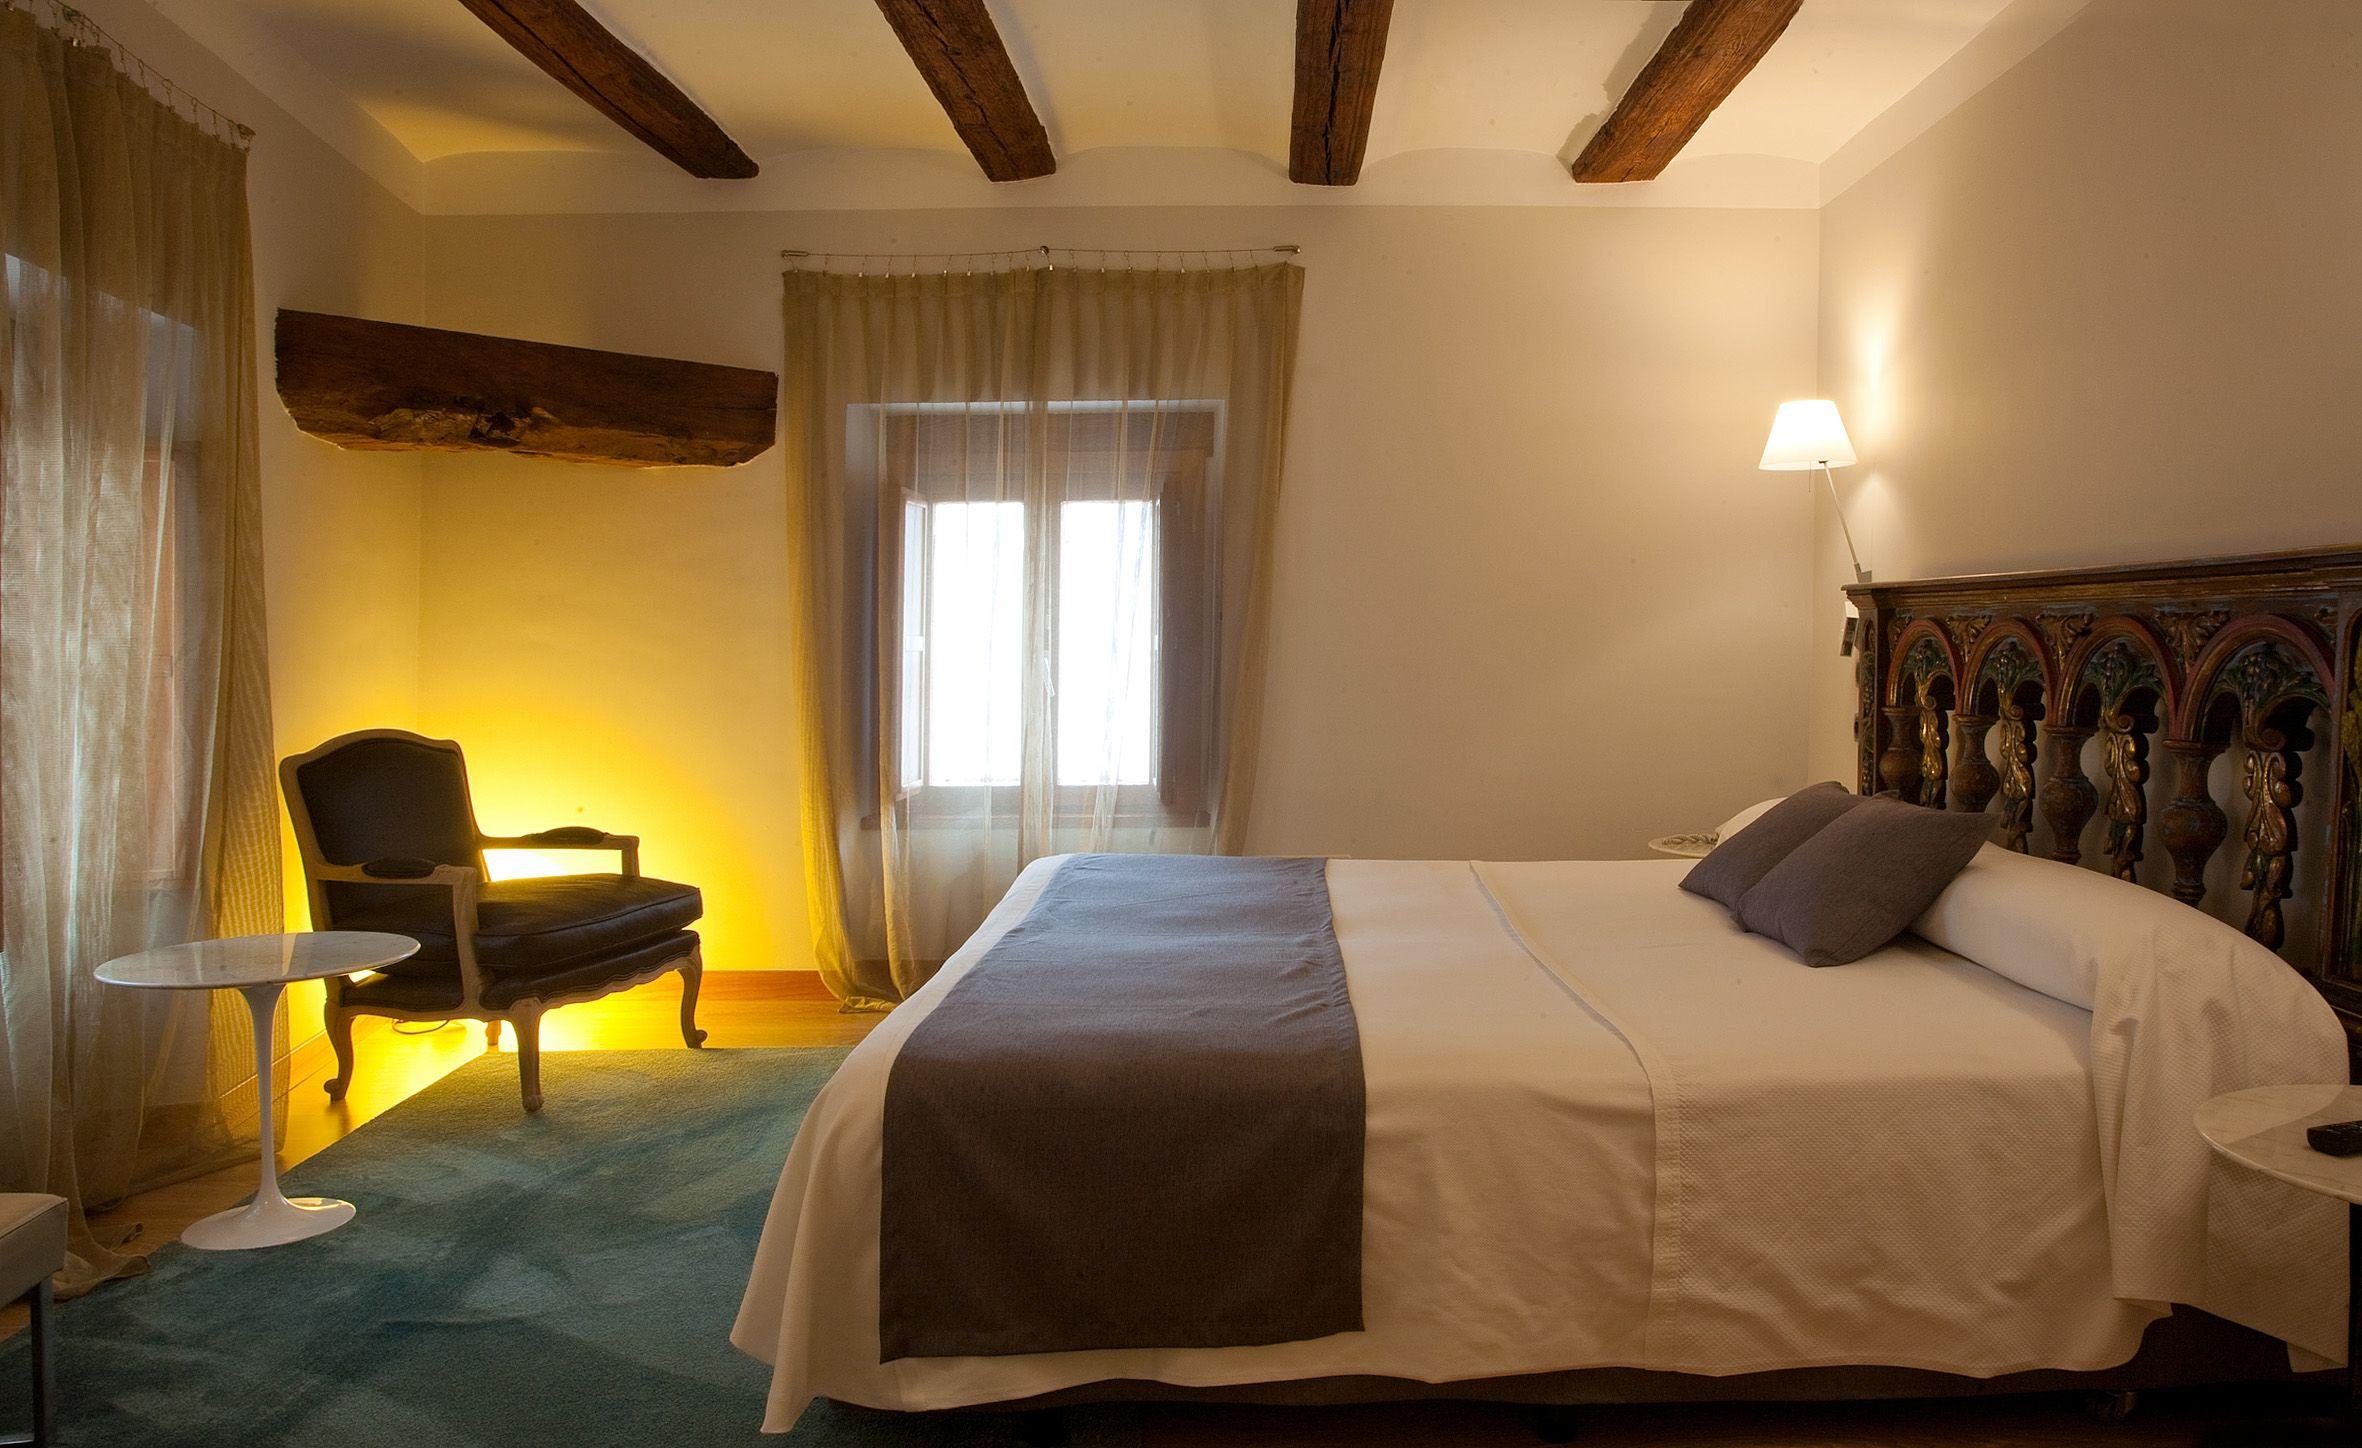 Hotel detallista con estética rústica en Estella, Navarra